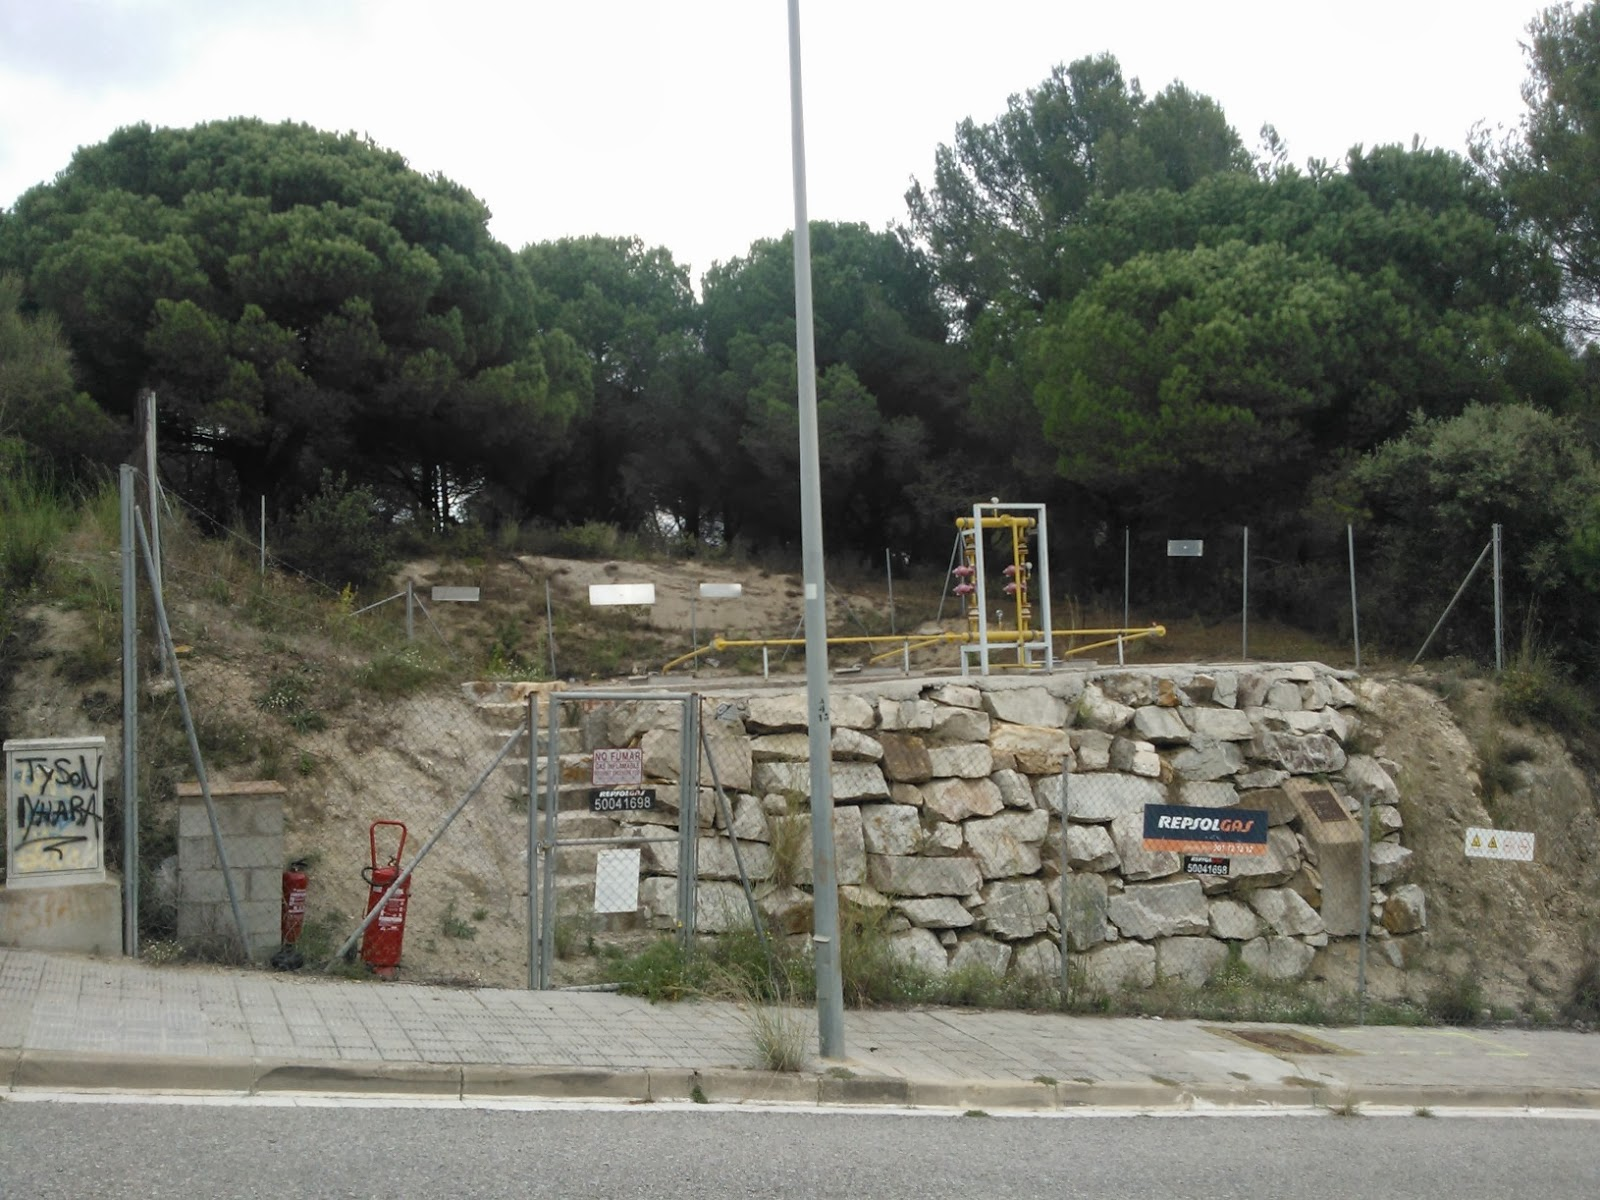 Adf maresme i vall s oriental compliment de la normativa - Serra bioclimatica normativa ...